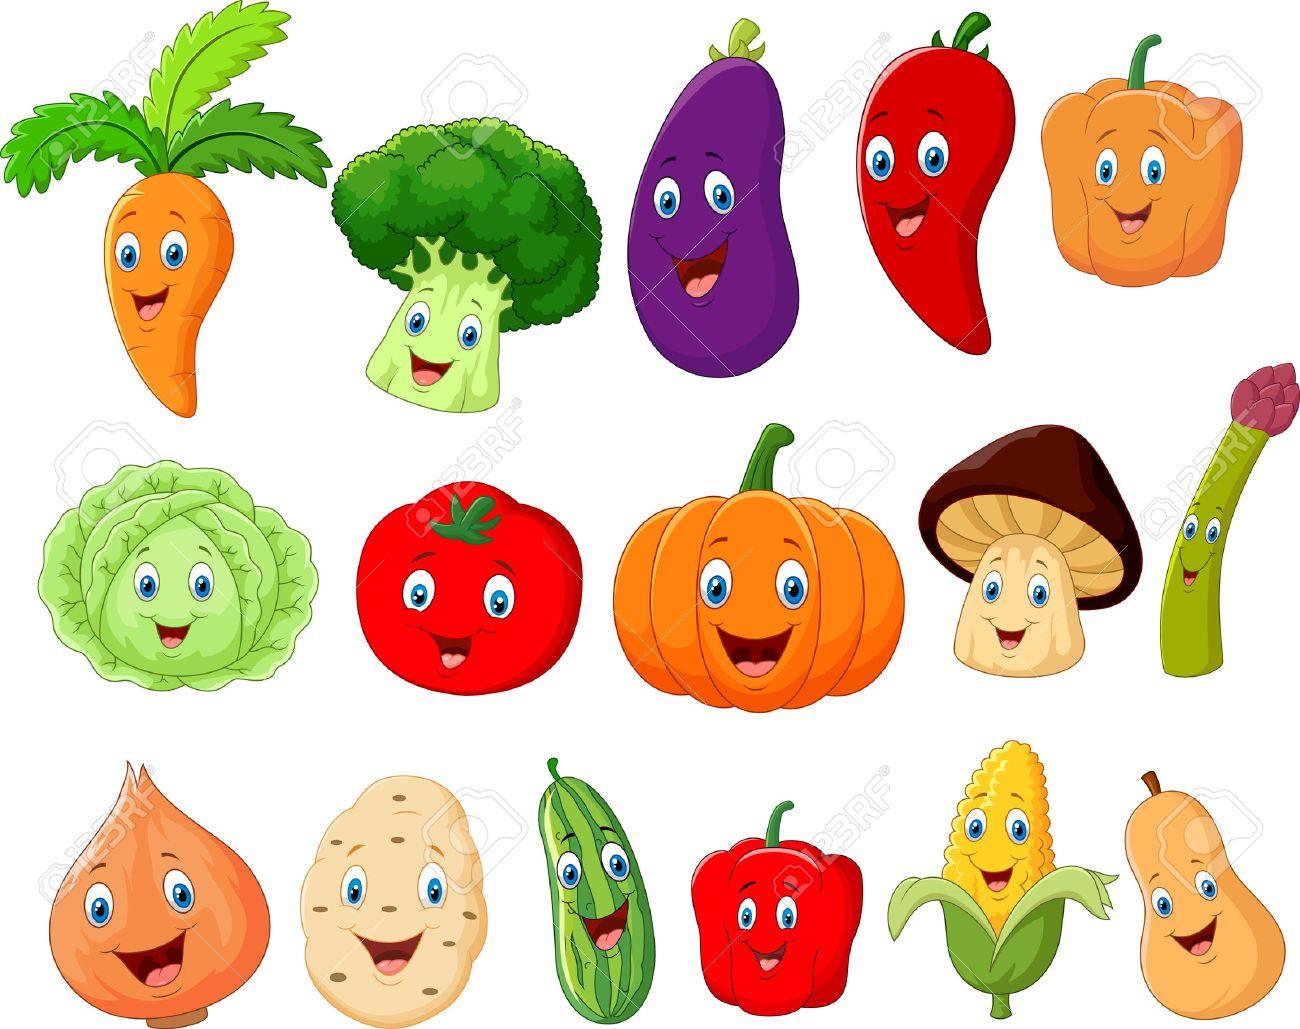 Cute vegetable cartoon character - 42124730